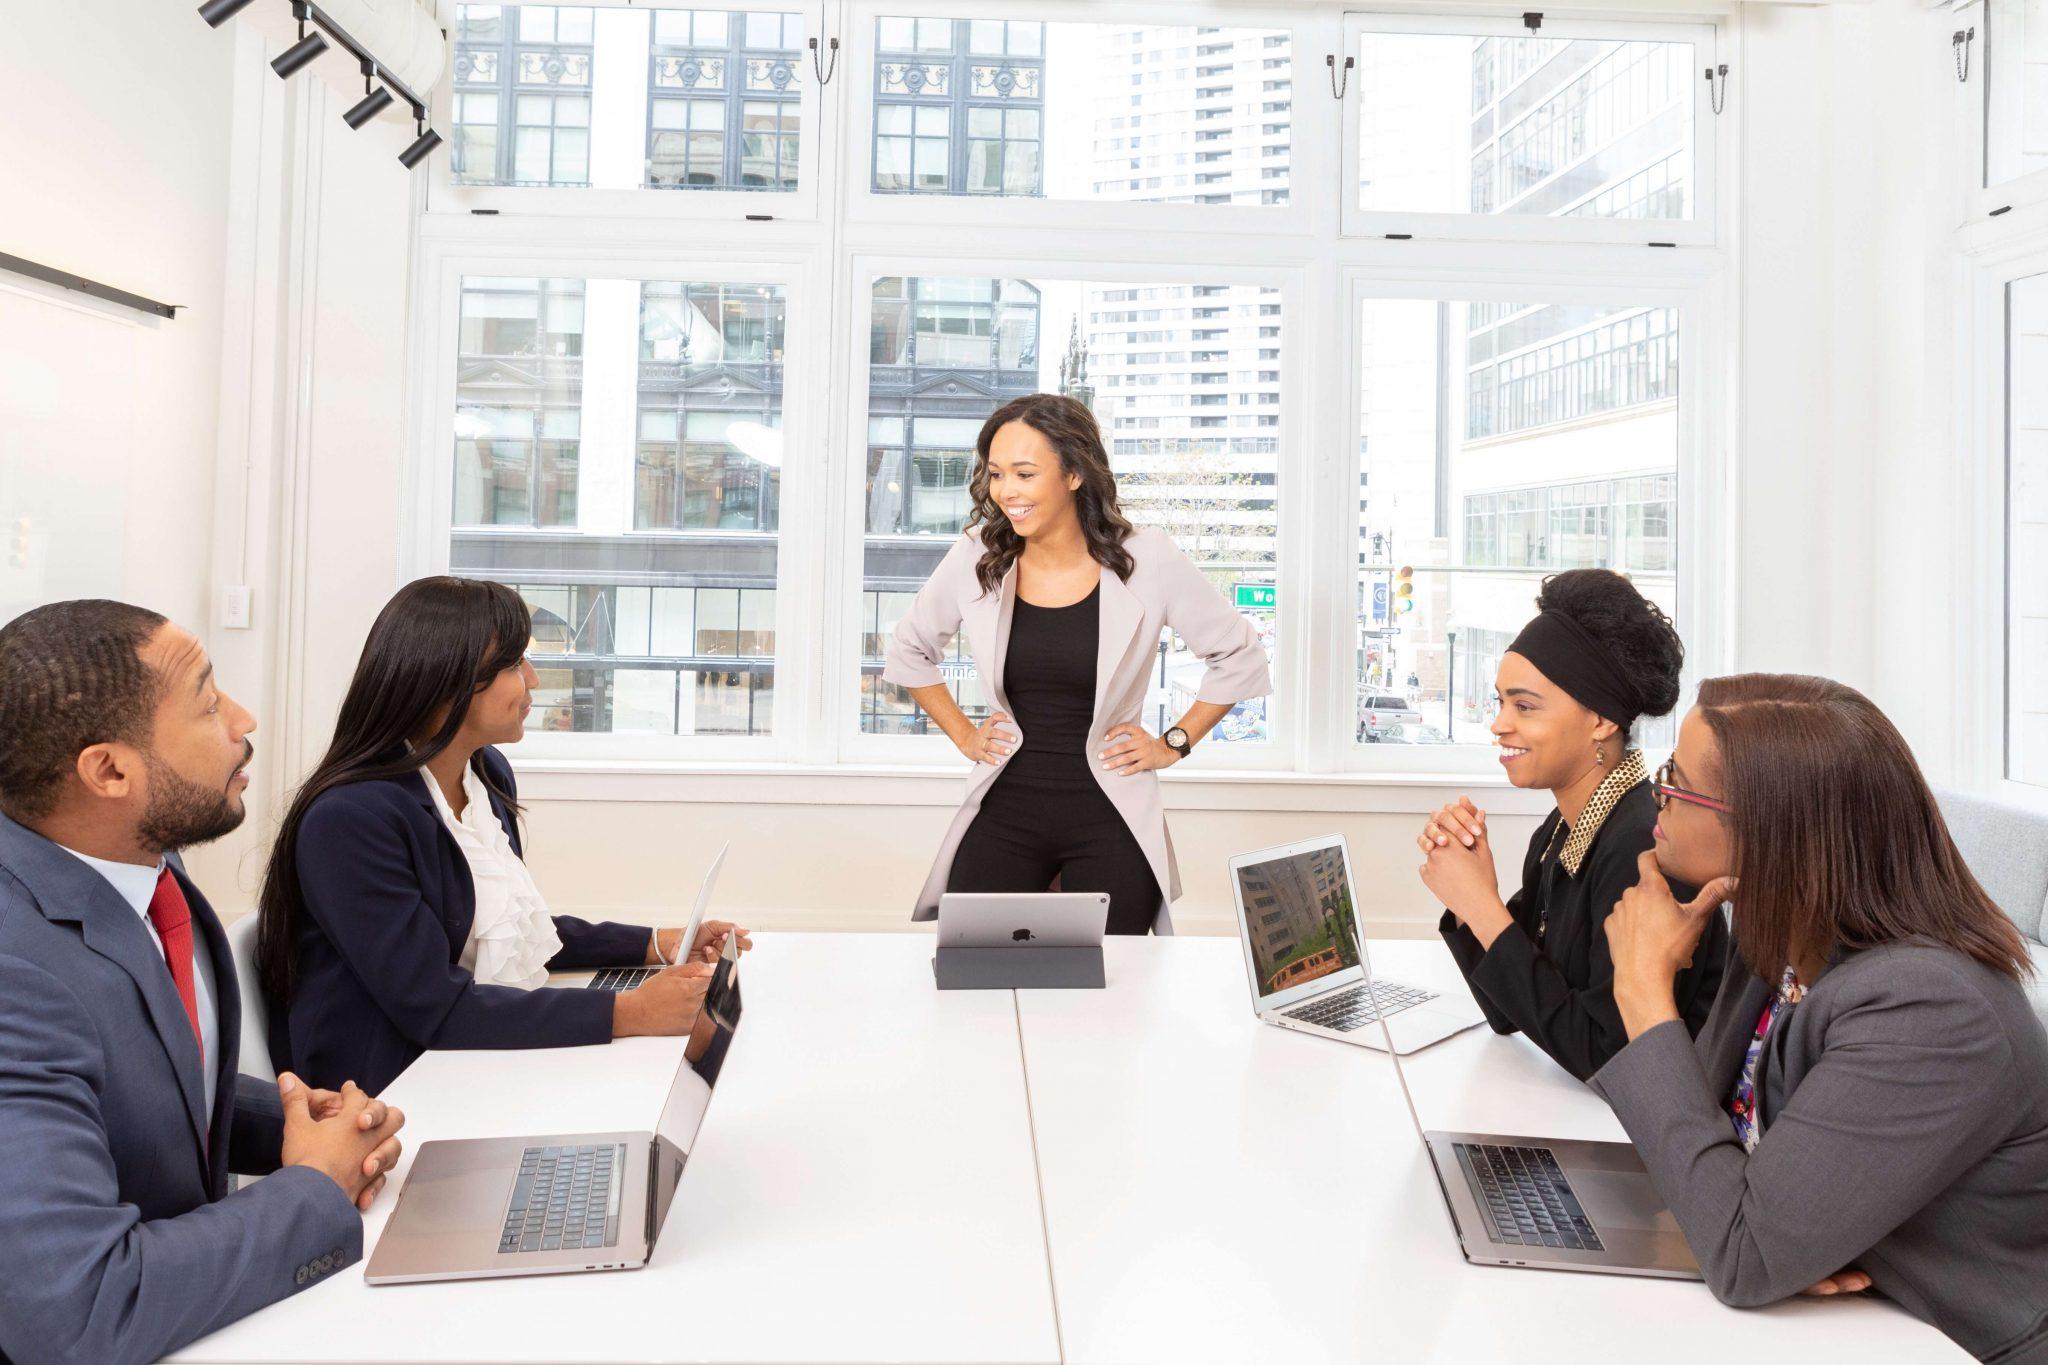 group-of-people-having-a-meeting